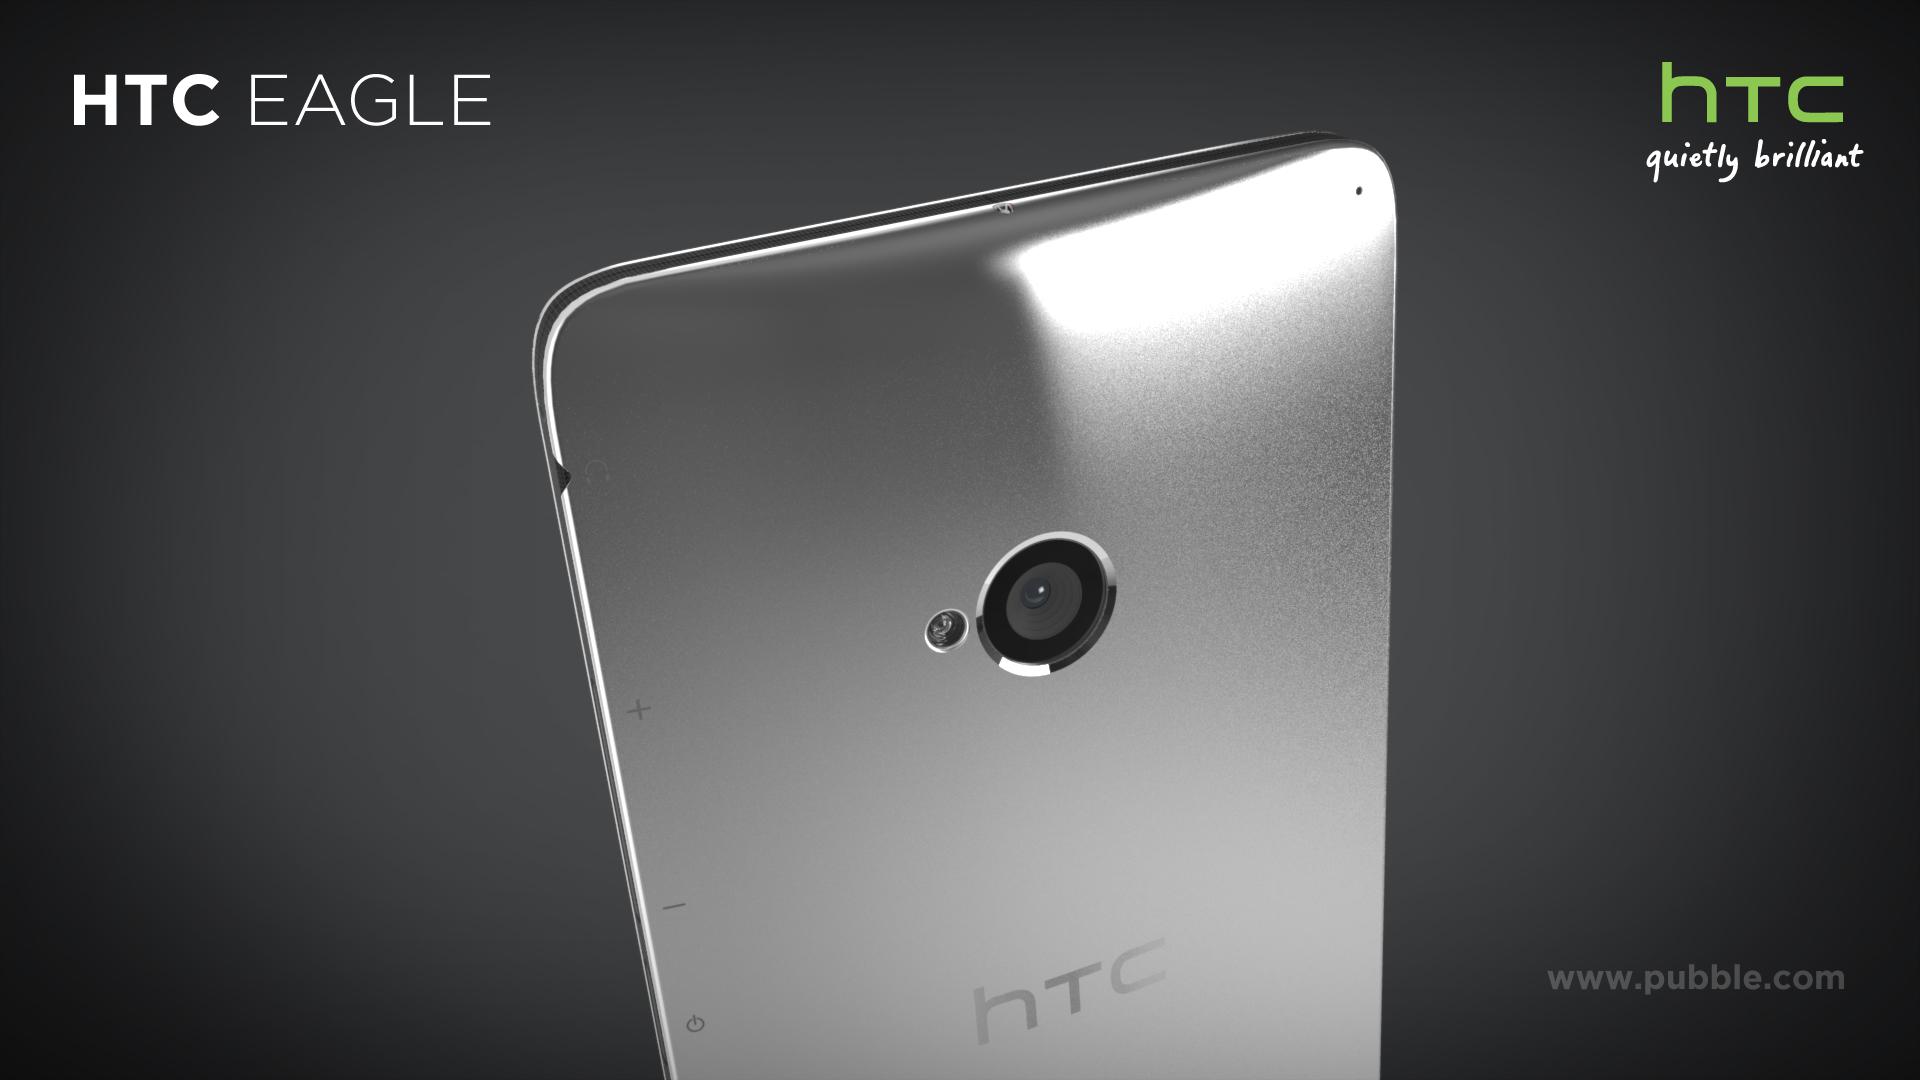 HTC Eagle - APN 2